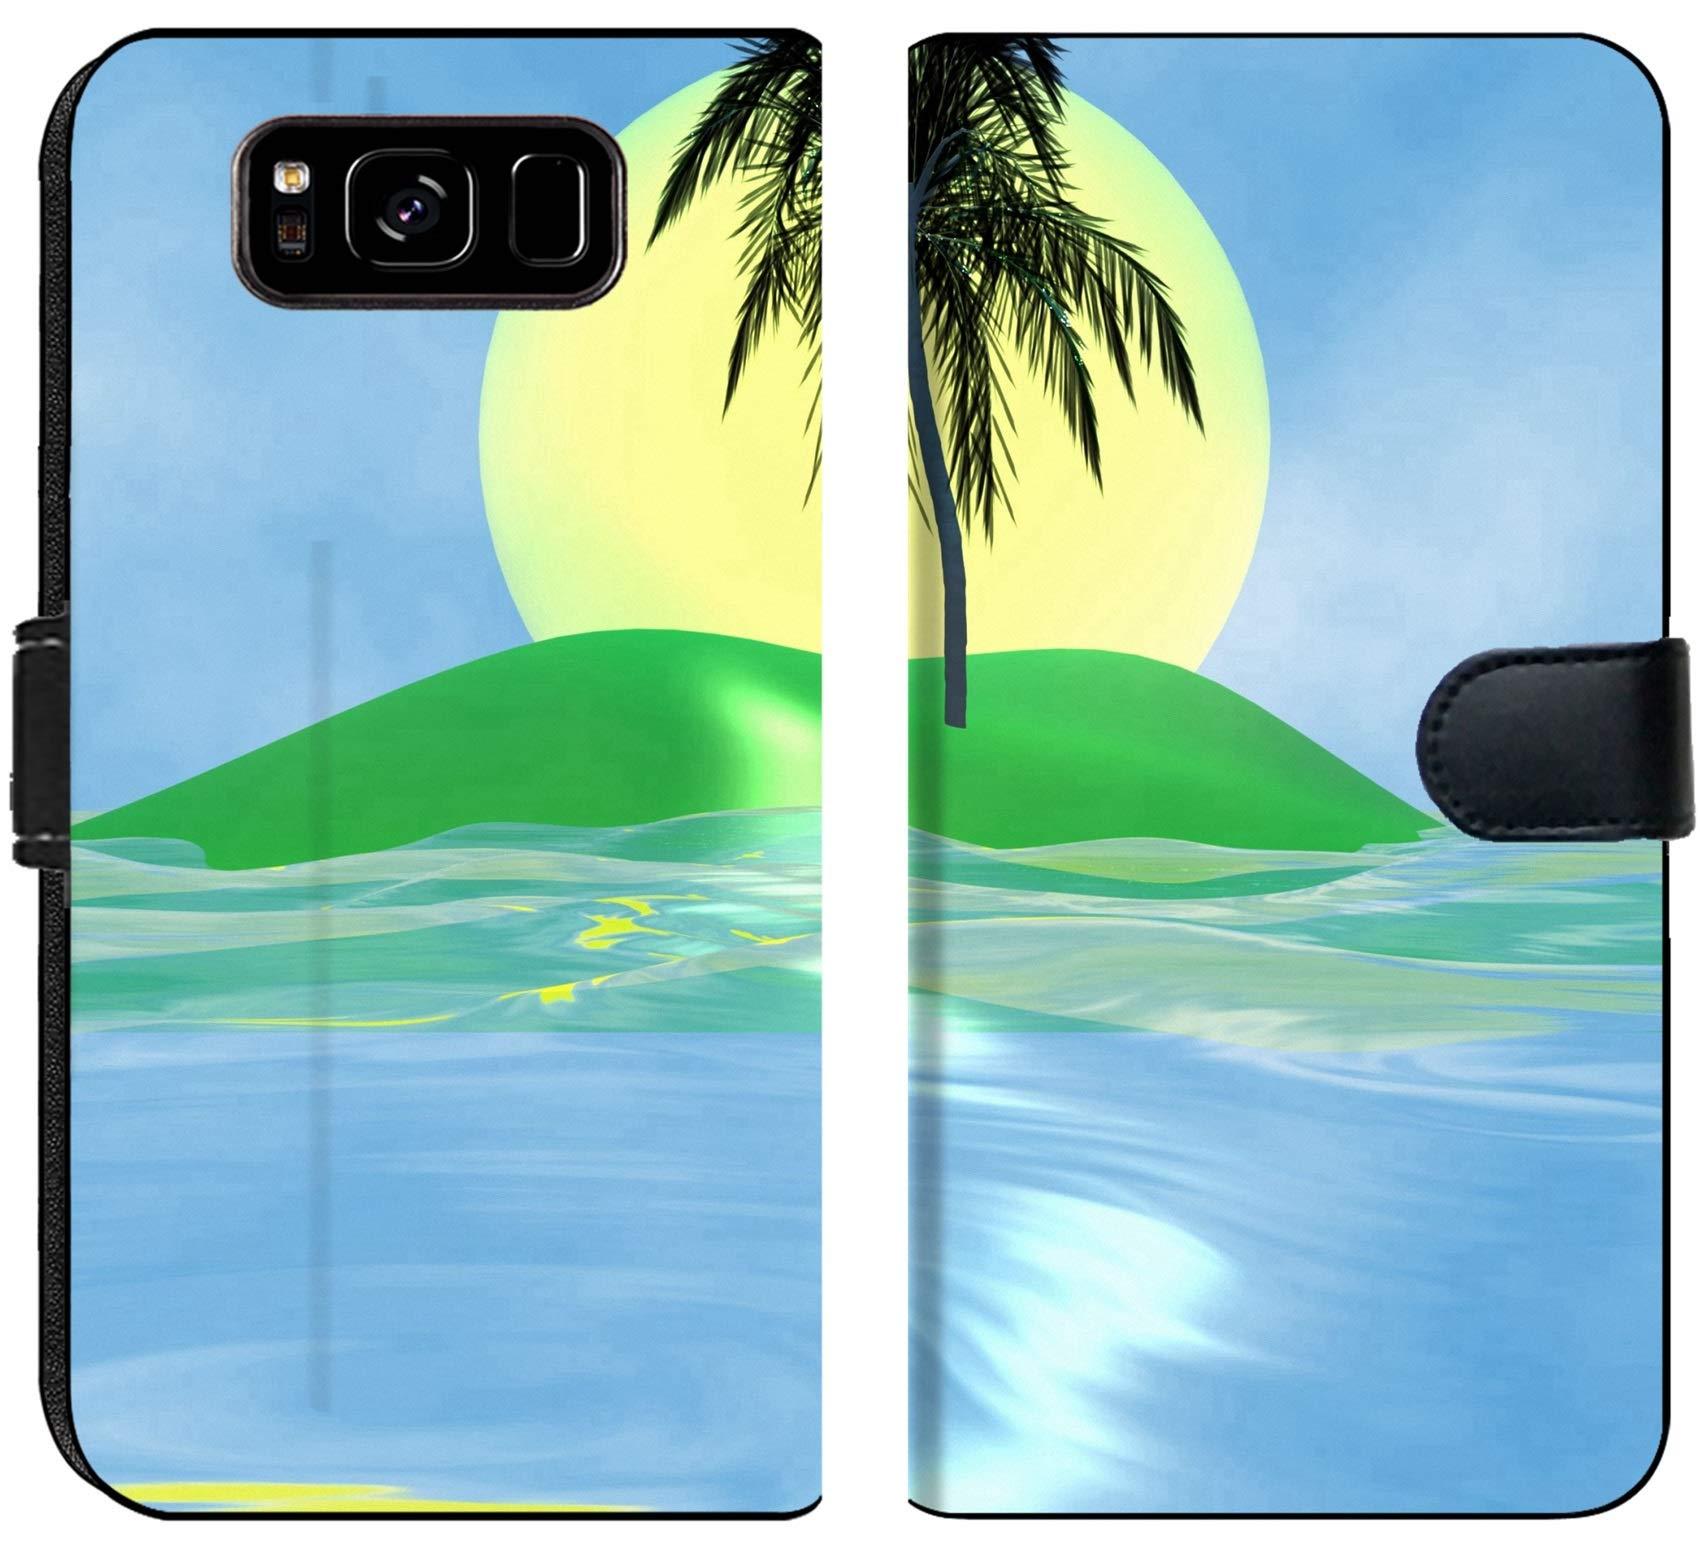 Luxlady Samsung Galaxy S8 Flip Fabric Wallet Case Solar Island with a Palm Tree in The Huge Dark Blue sea Image ID 2842537